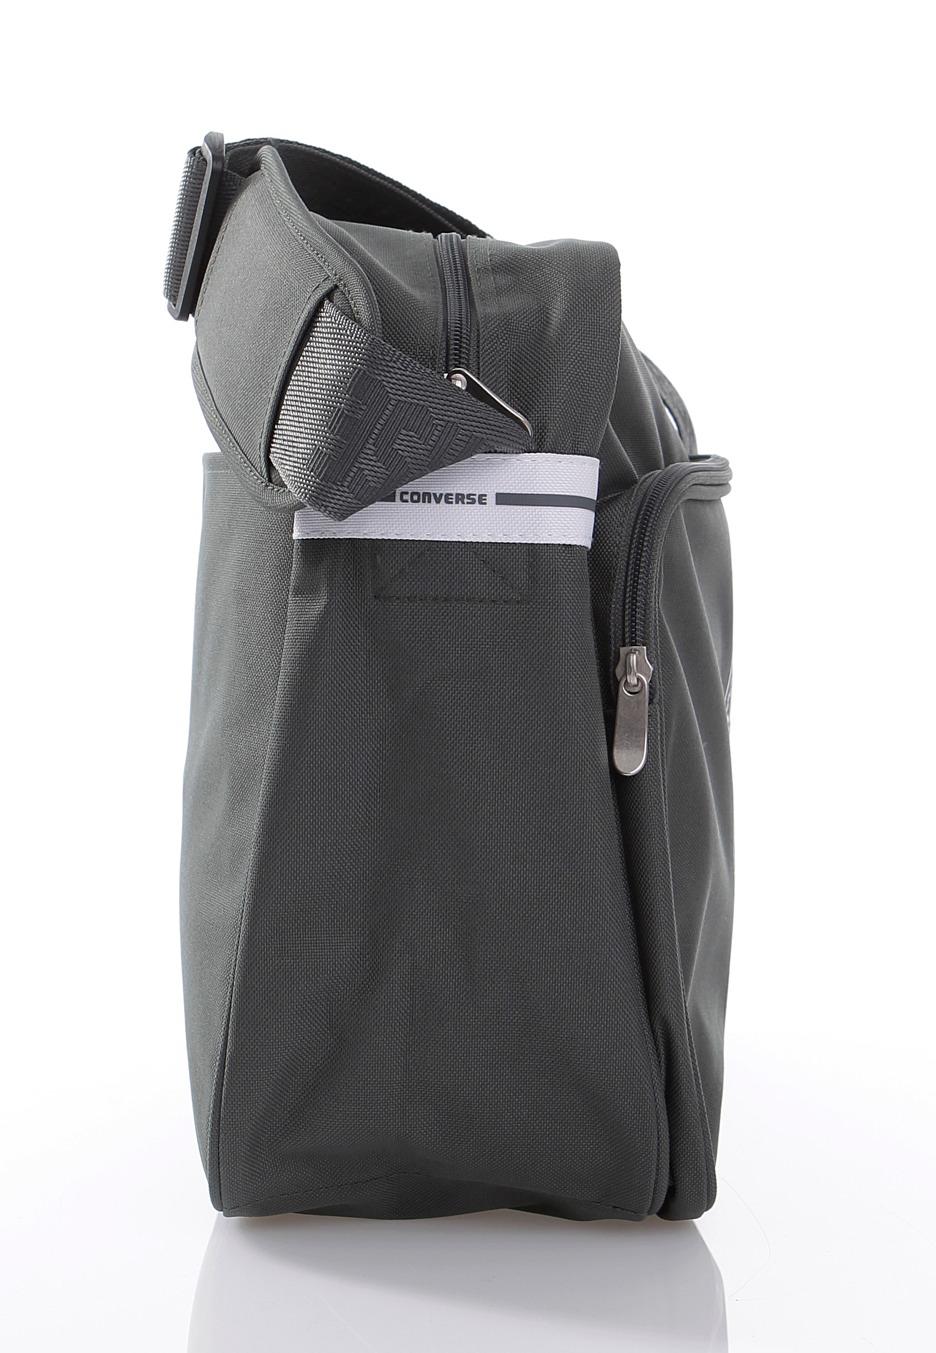 Converse - Reporter Dark Grey - Bag - Impericon.com UK 8268de14e8